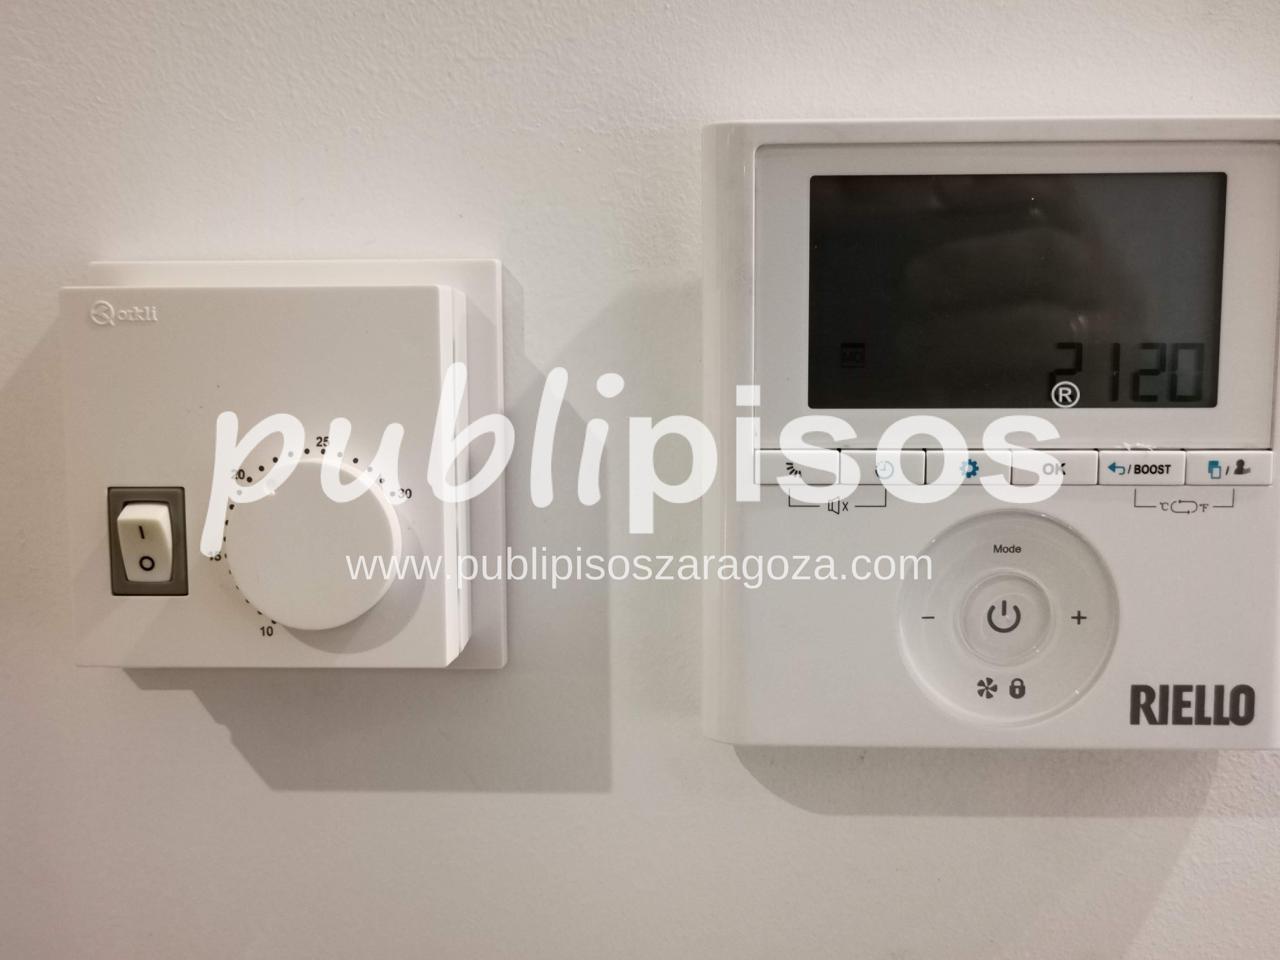 Piso obra nueva centro Zaragoza-25